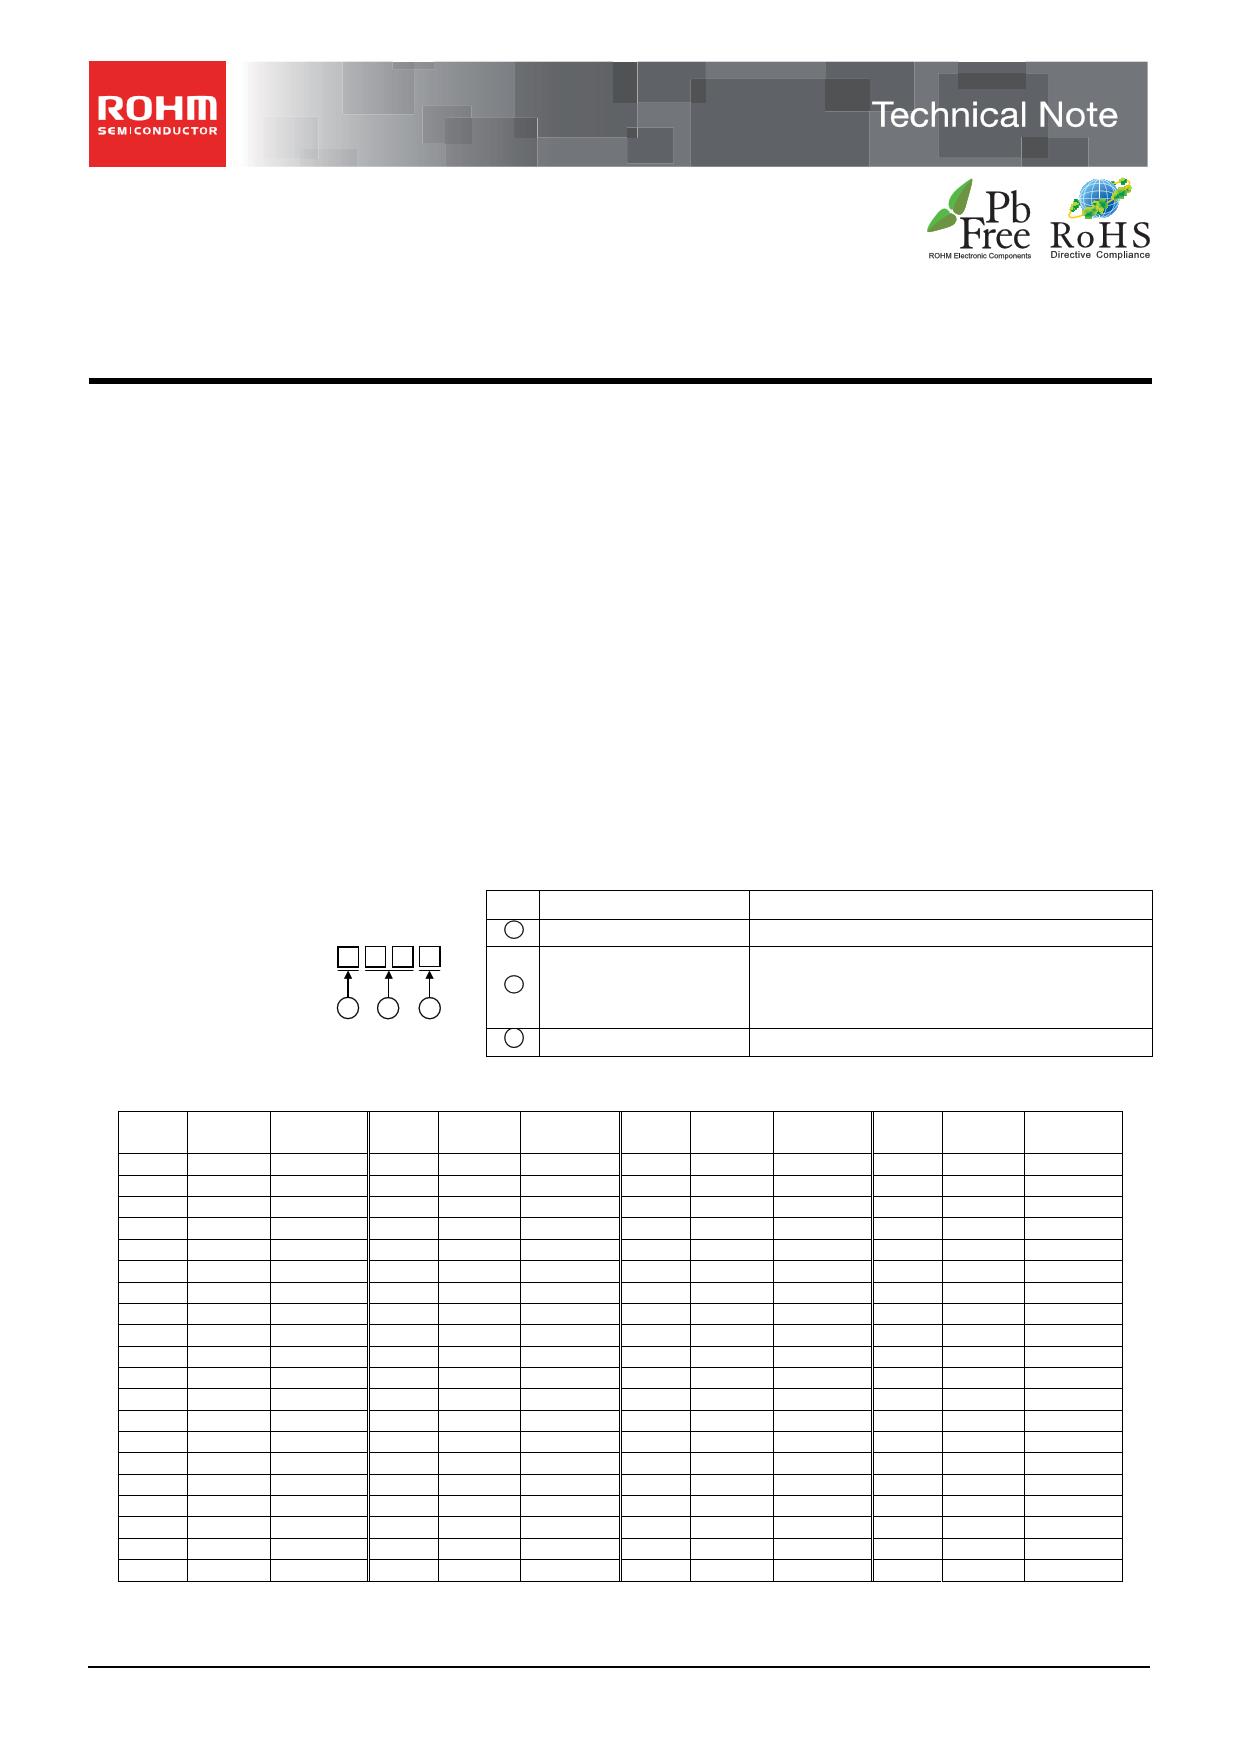 BU4945 데이터시트 및 BU4945 PDF